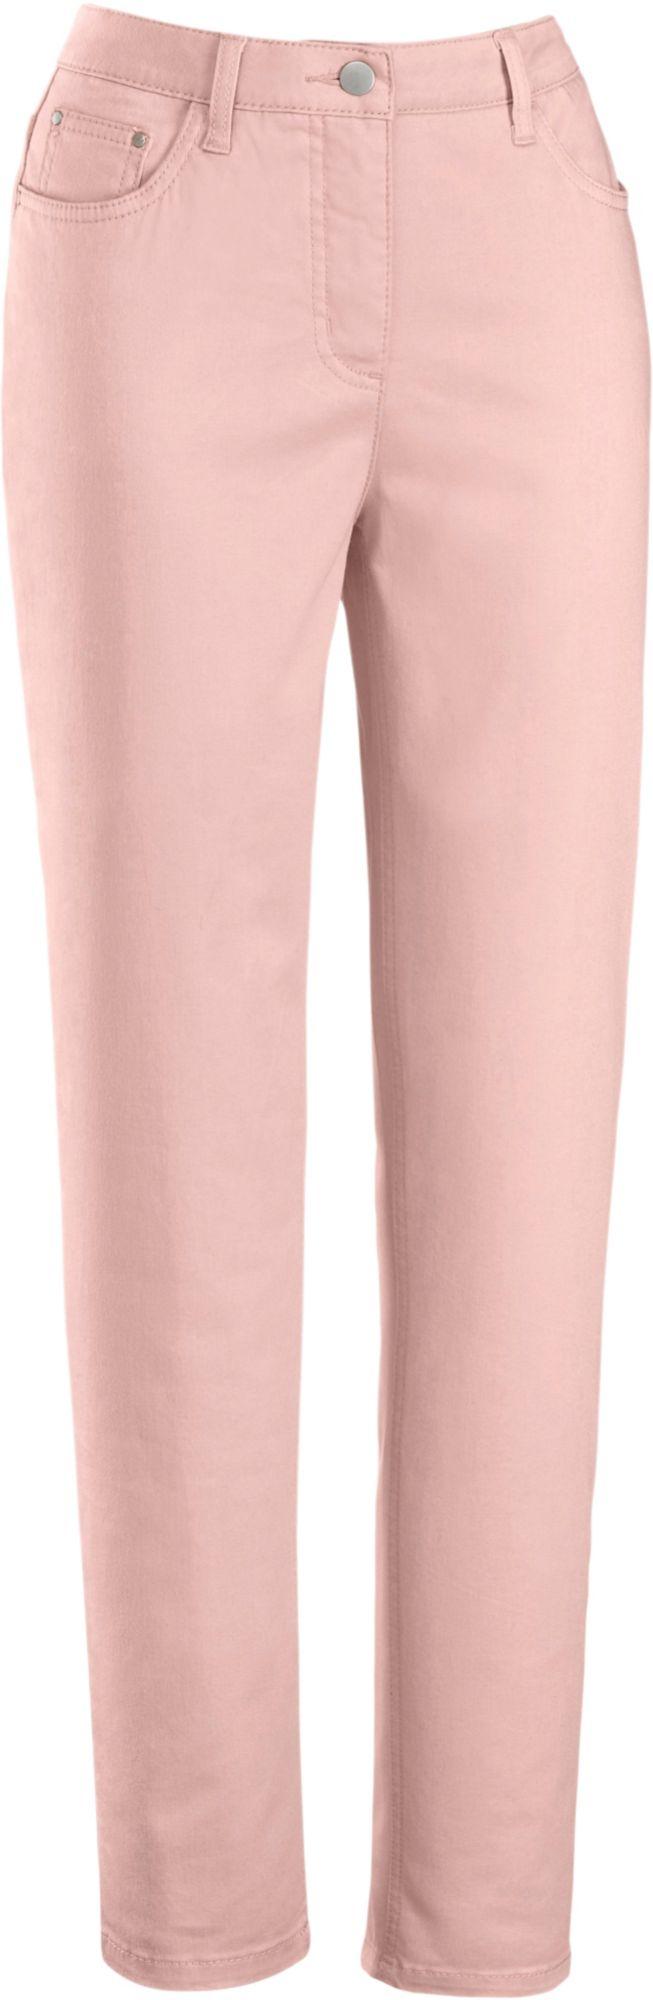 AMBRIA Ambria Hose in 5-Pocket-Form